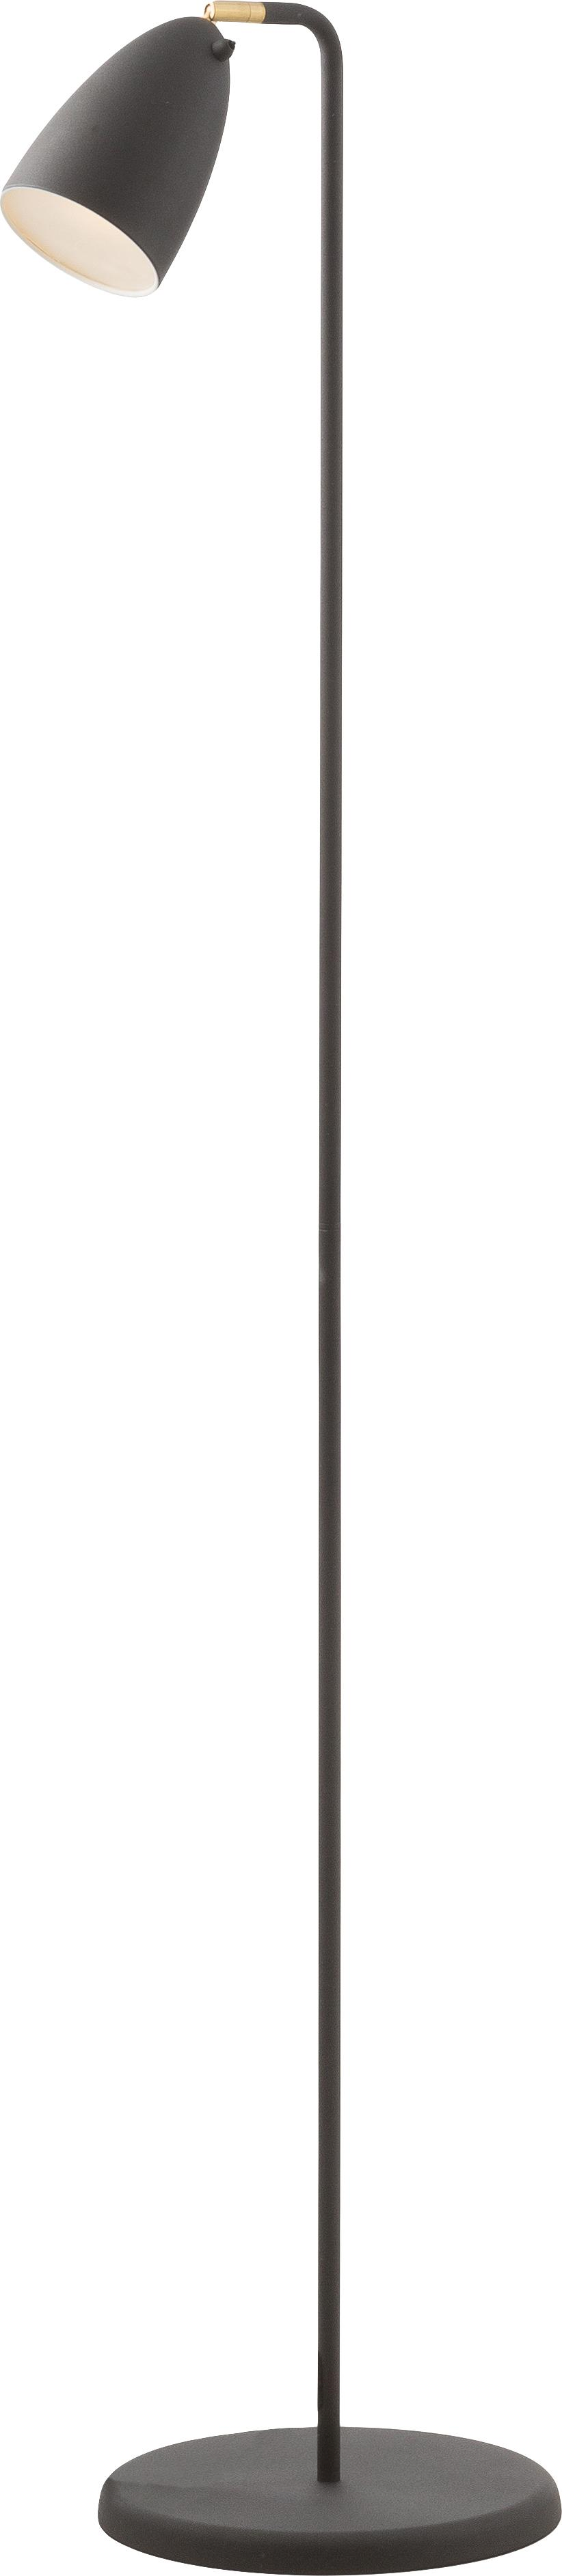 Leselampe Nexus aus Metall, Lampenschirm: Metall, pulverbeschichtet, Lampenfuß: Metall, pulverbeschichtet, Dekor: Metall, vermessingt, Schwarz, Ø 26 x H 142 cm